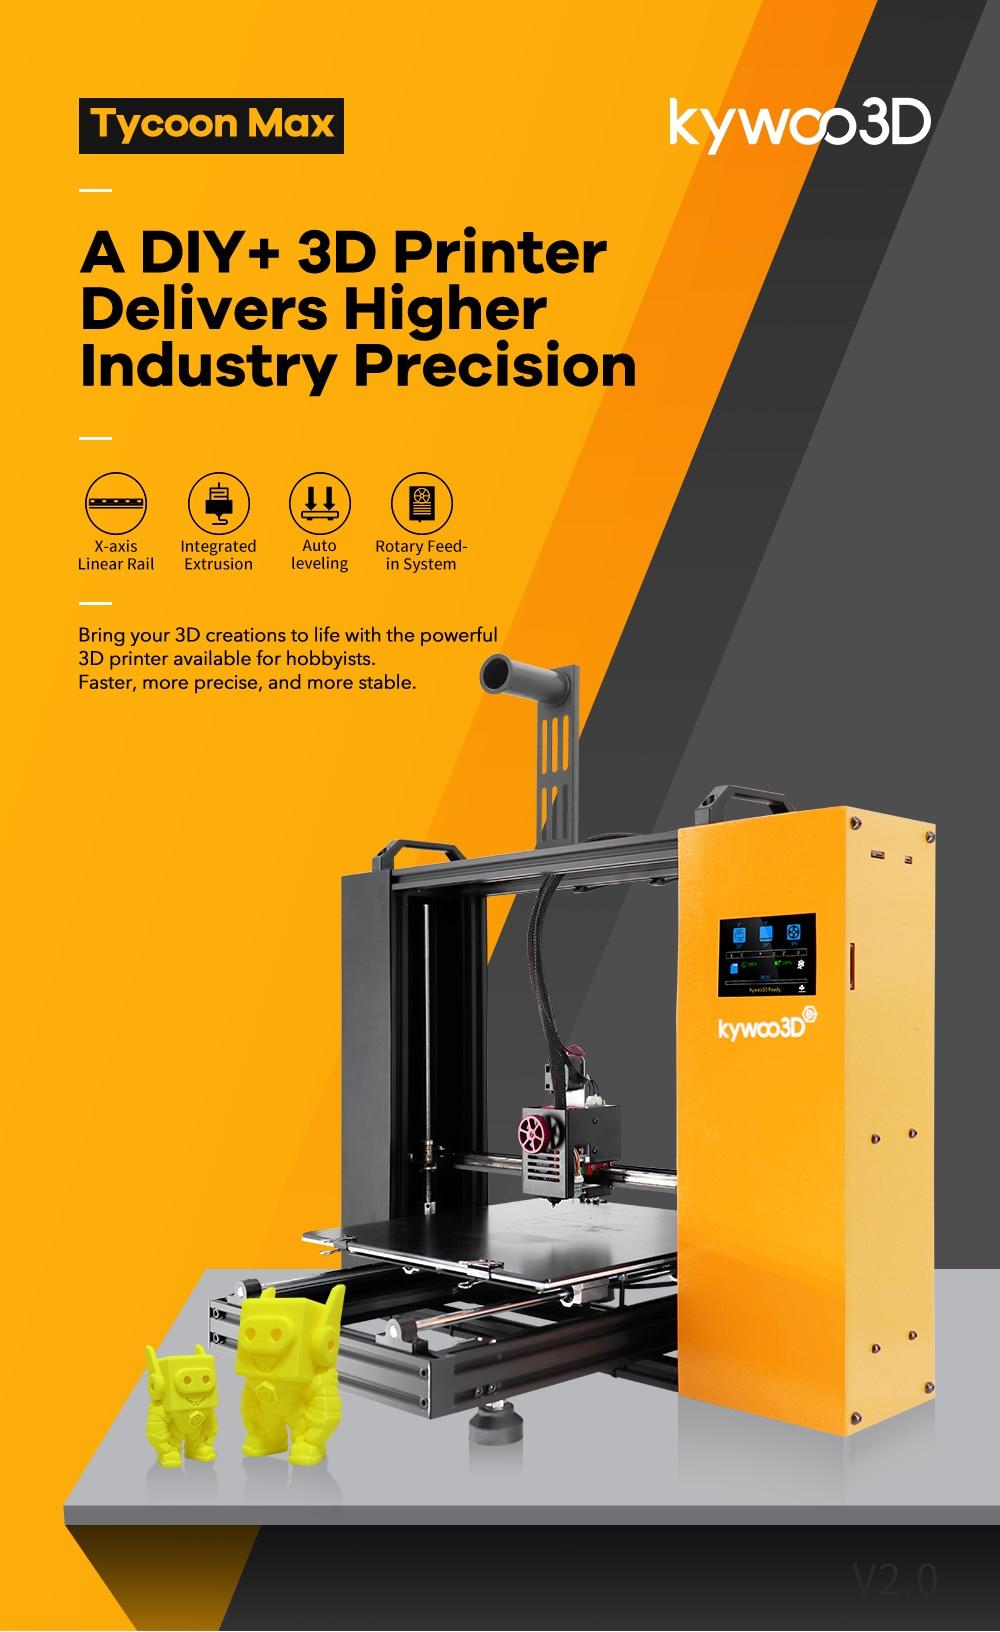 Kywoo Tycoon Max: An affordable DIY 3D Printer